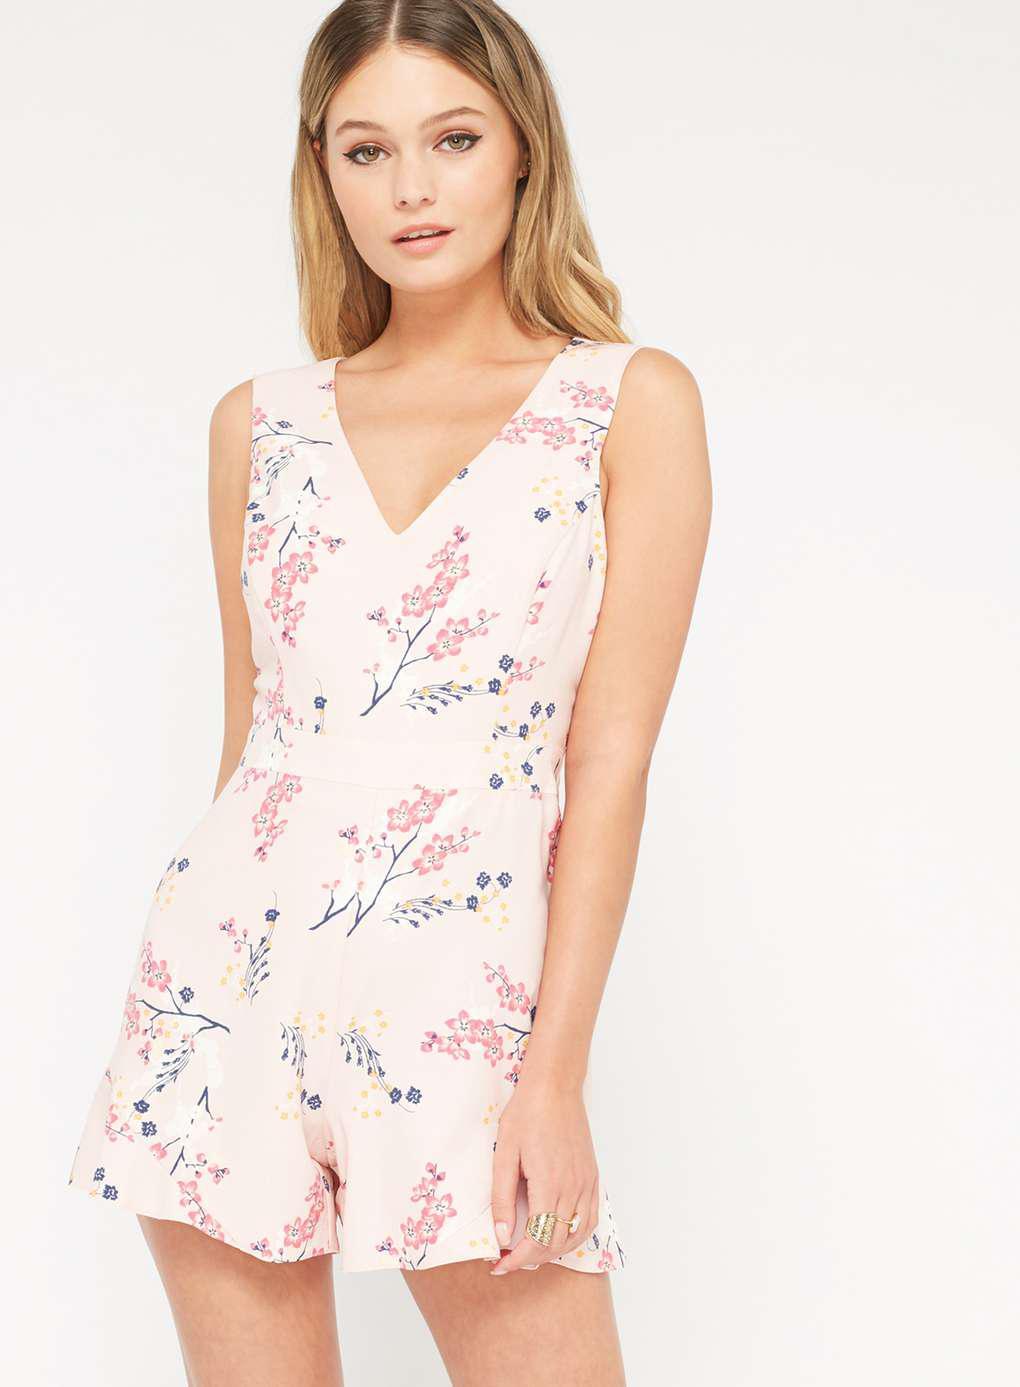 7172c7c4cf5b Lyst - Miss Selfridge Petite Floral Print Ruffle Playsuit in Pink